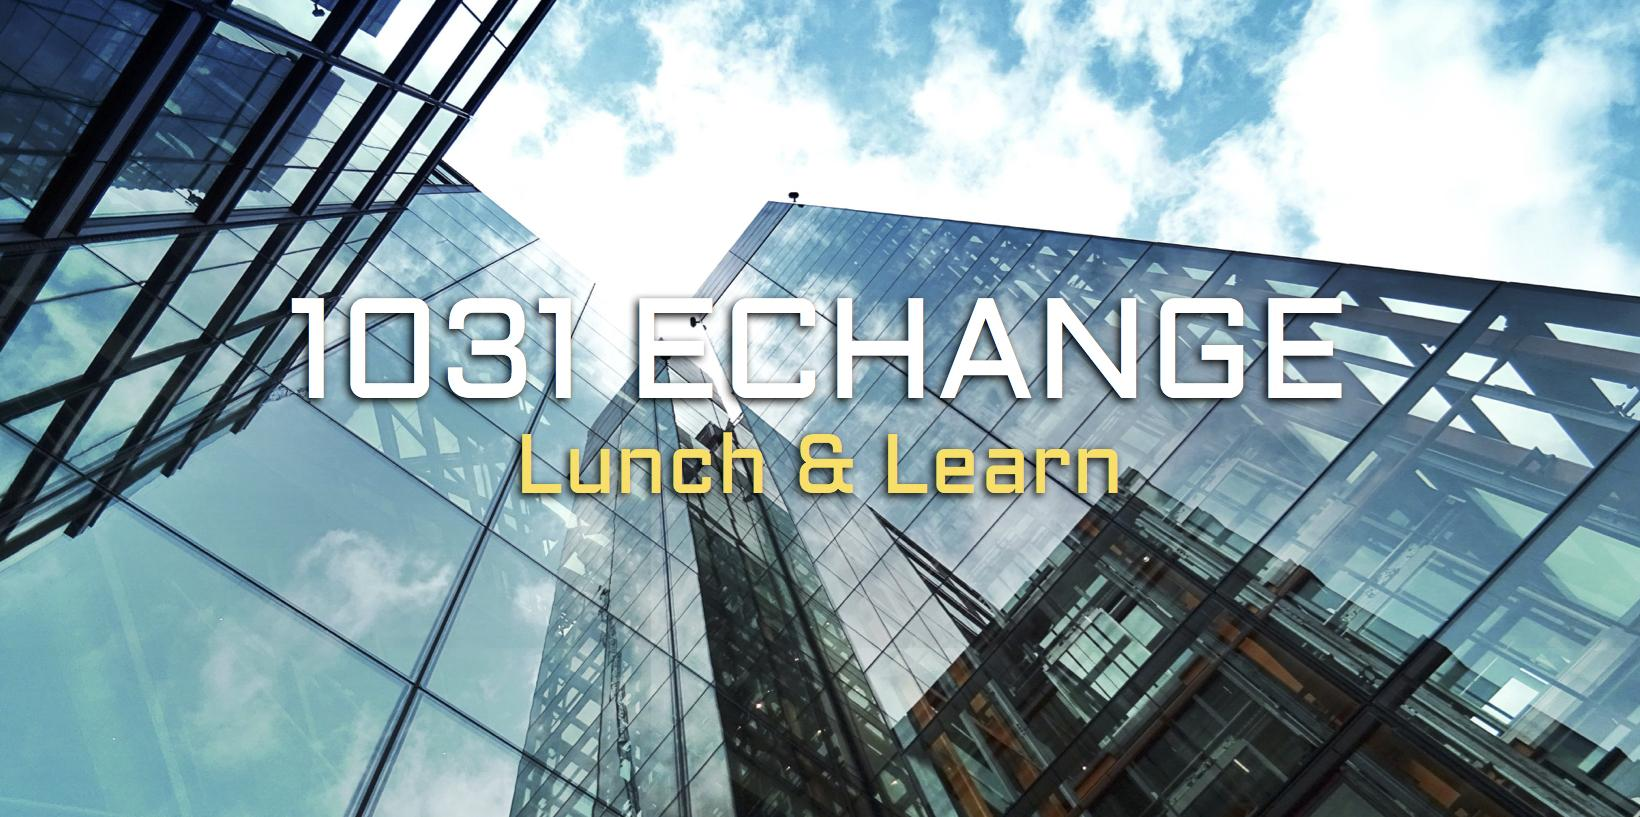 1031 Exchange Lunch & Learn (3 FREE Clock-Hou